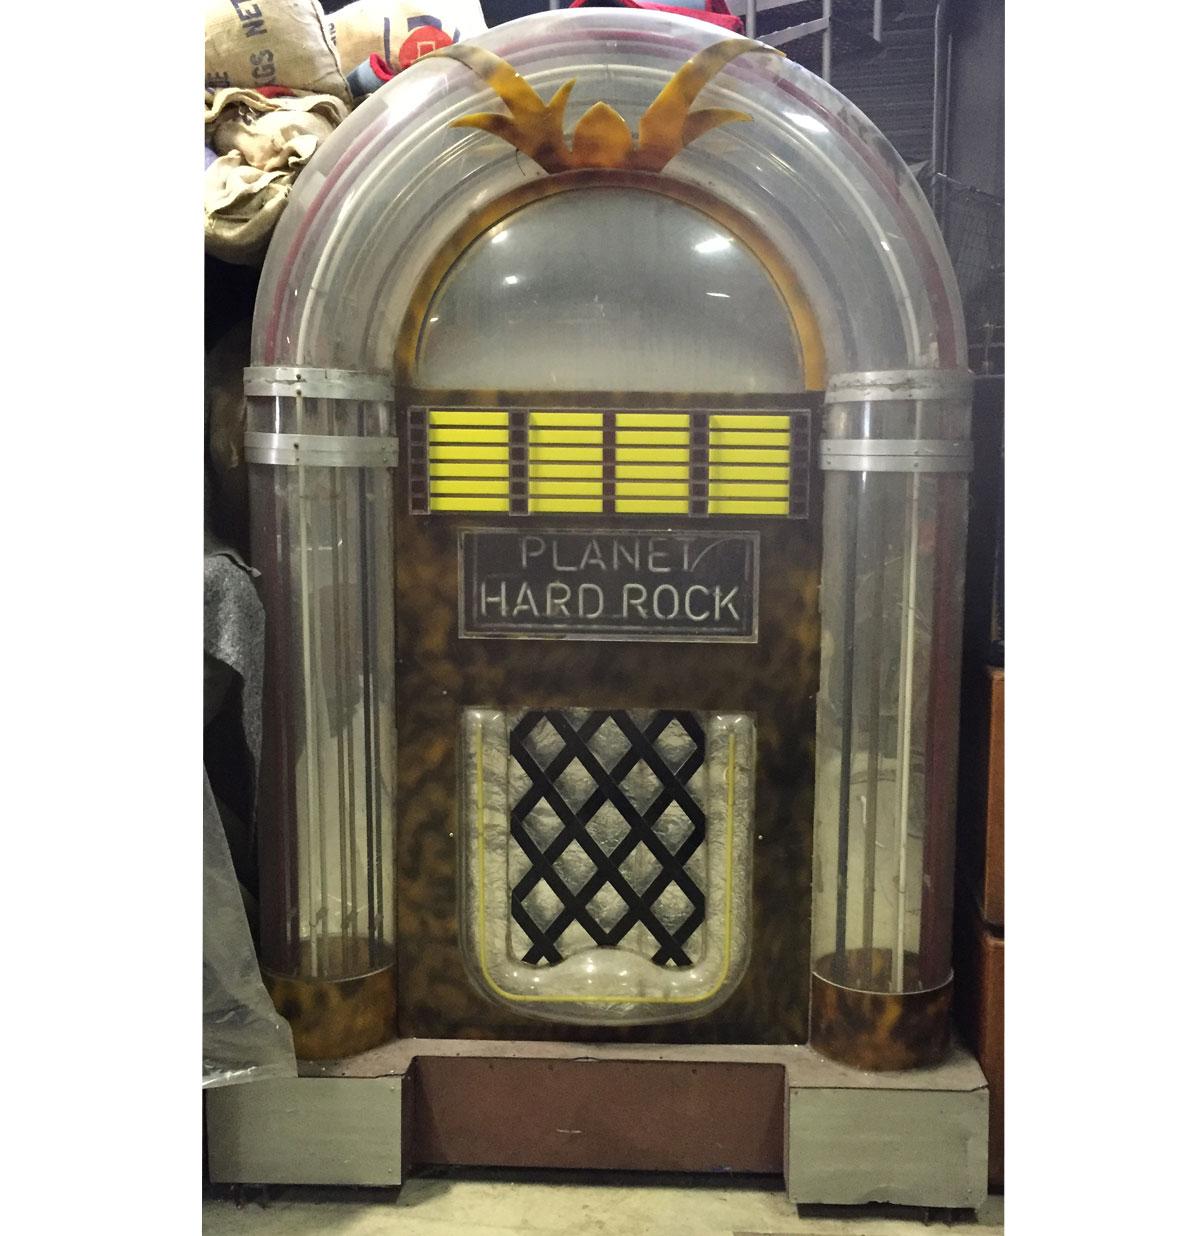 Mega jukebox Decor 'Planet Hard Rock' met neon 2,5 meter